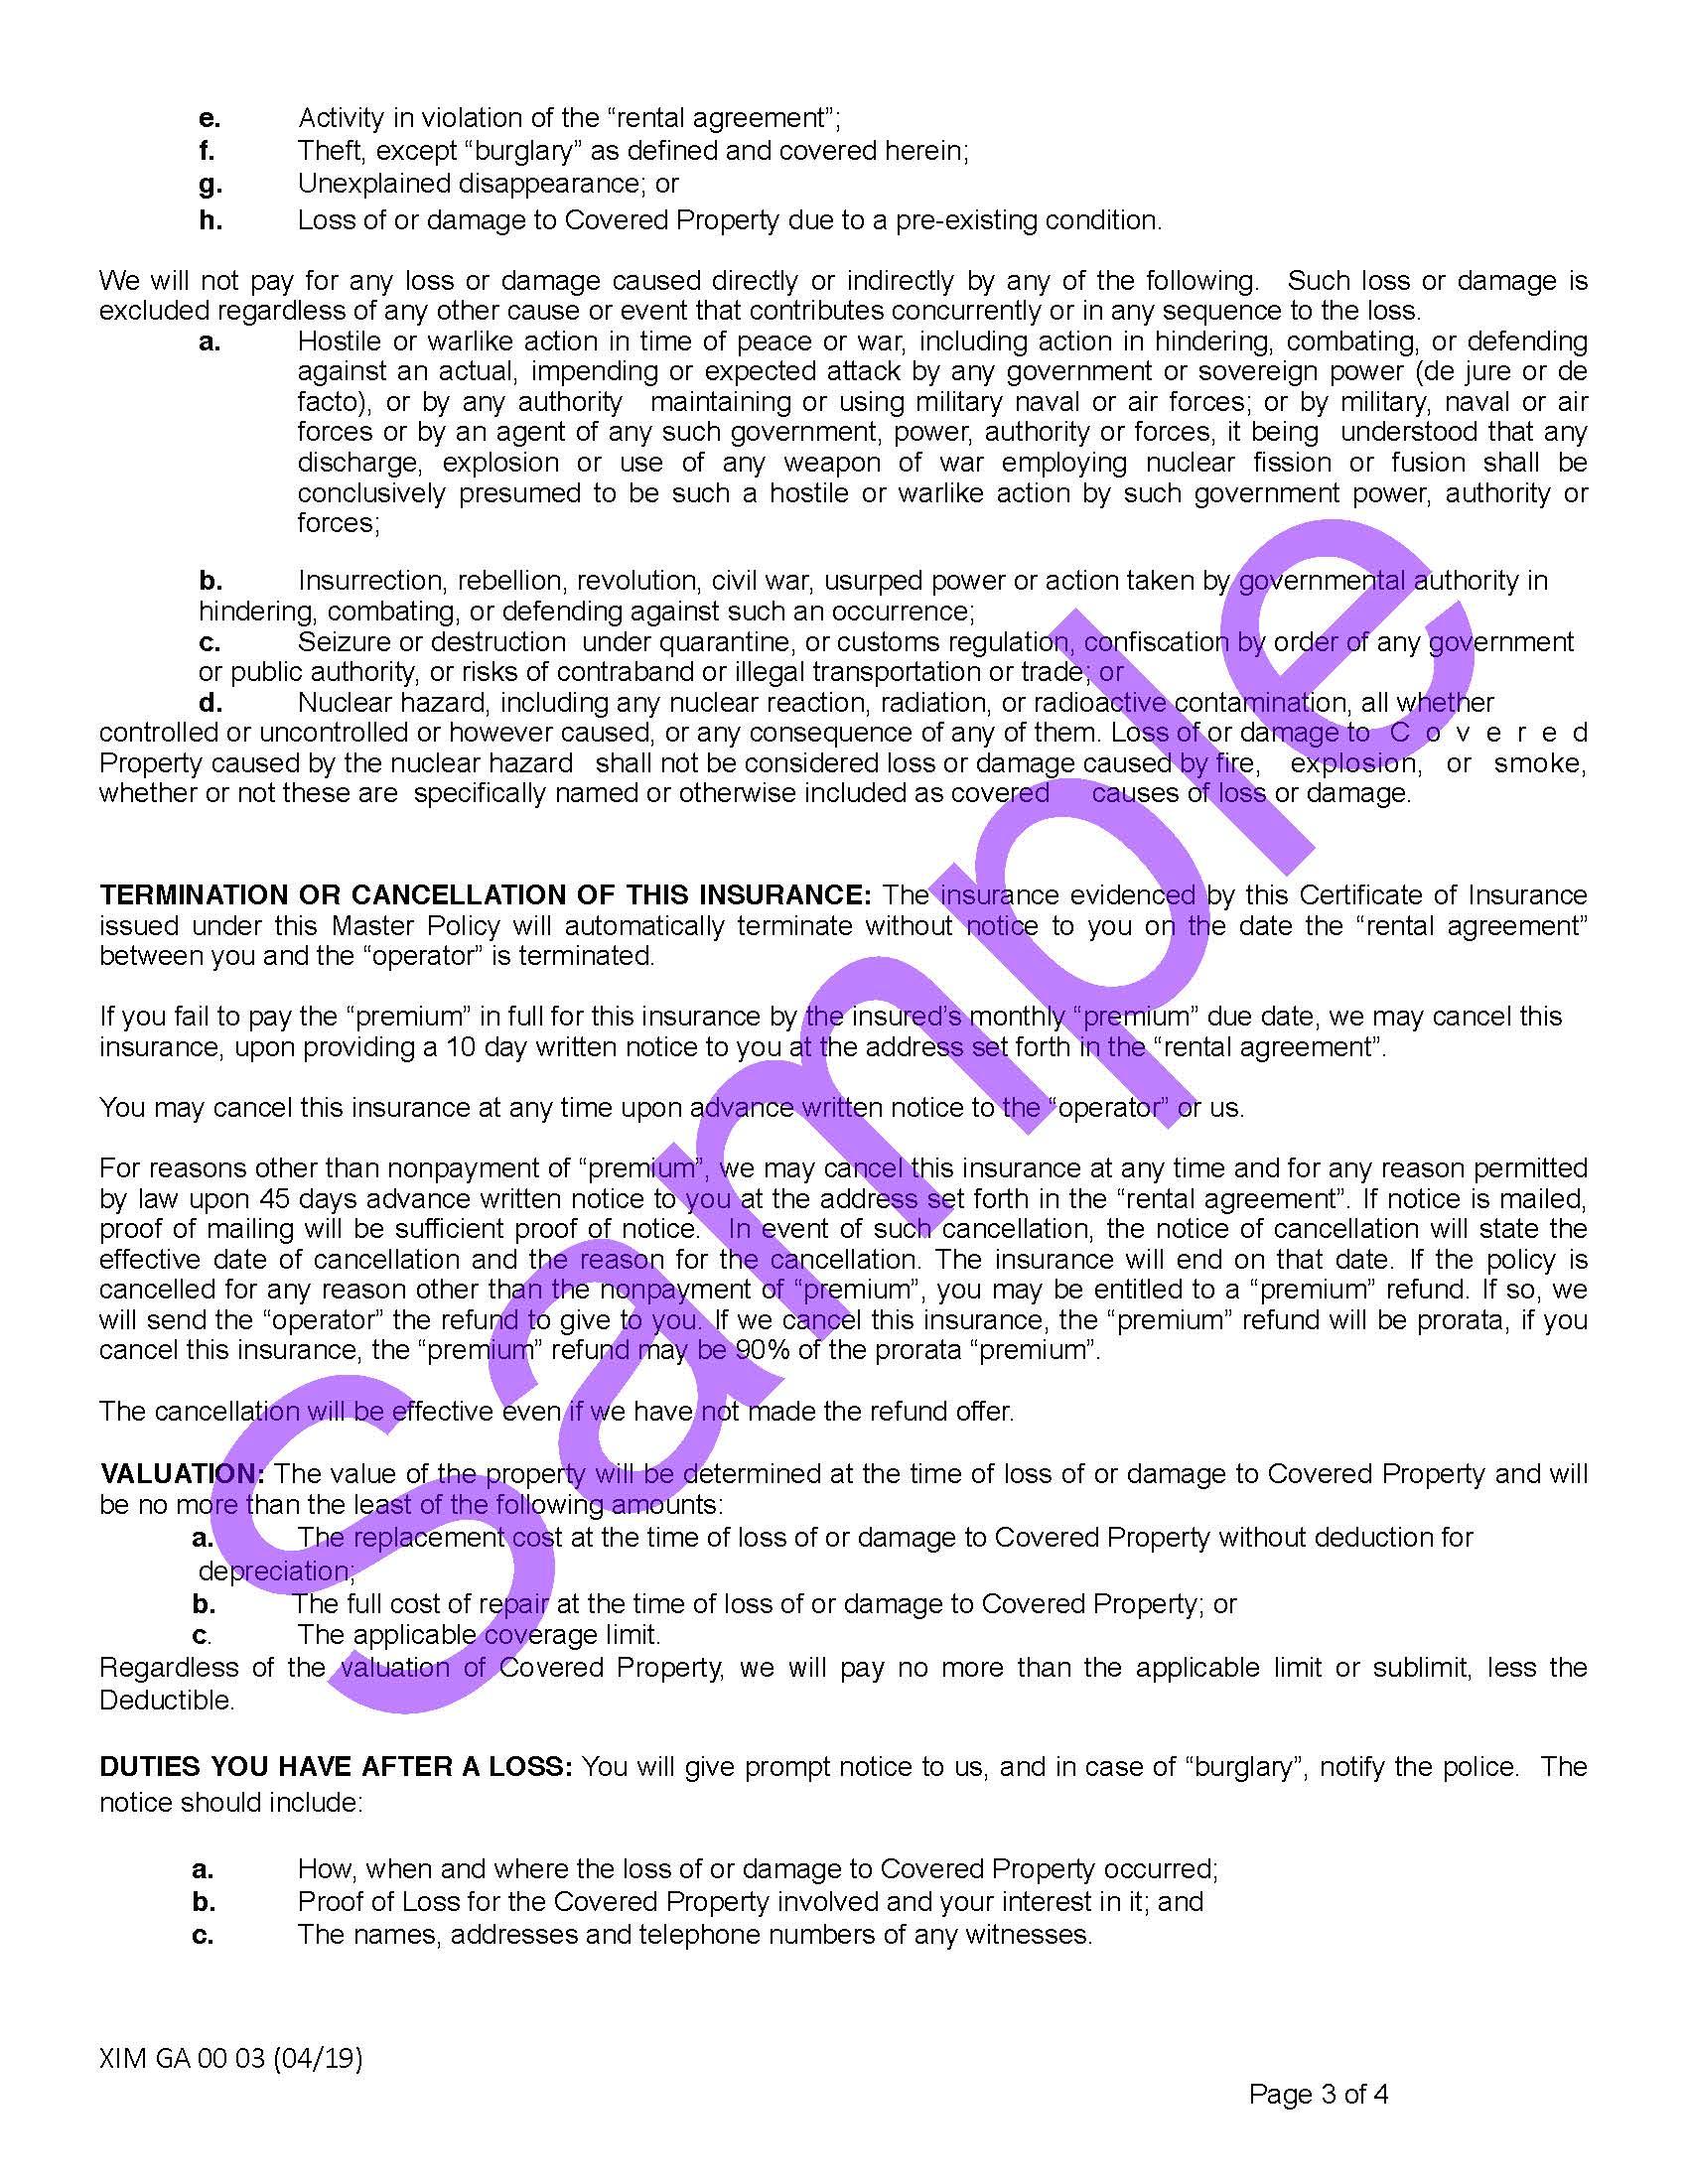 XIM GA 00 03 04 19 Georgia Certificate of Storage InsuranceSample_Page_3.jpg